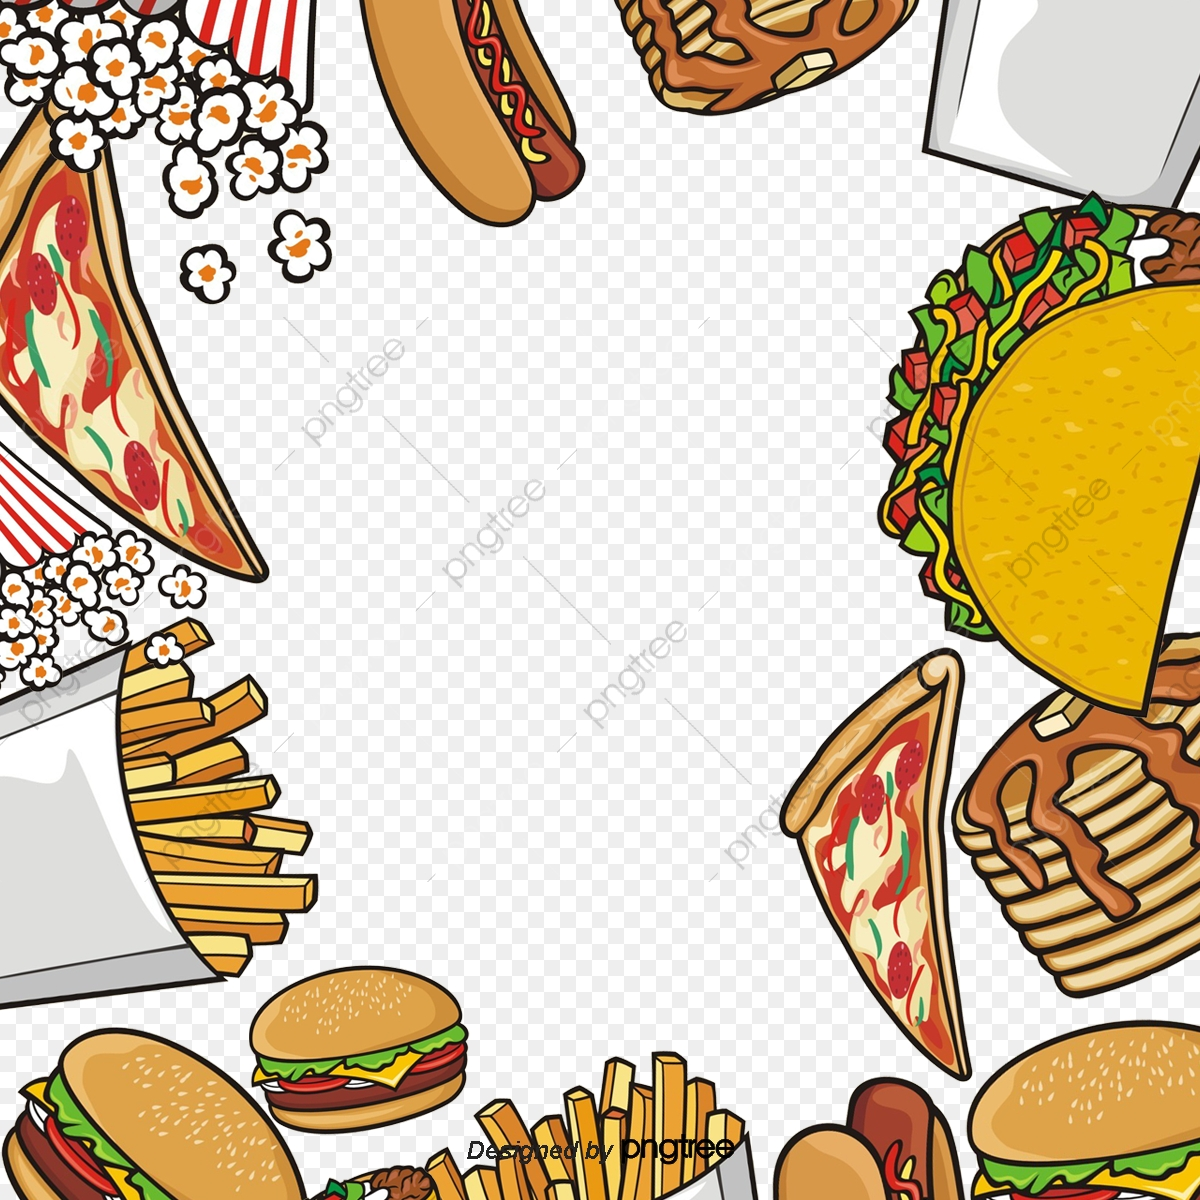 Kartun Cepat Makanan Hamburger Goreng Bentuk Unsur Unsur Kartun